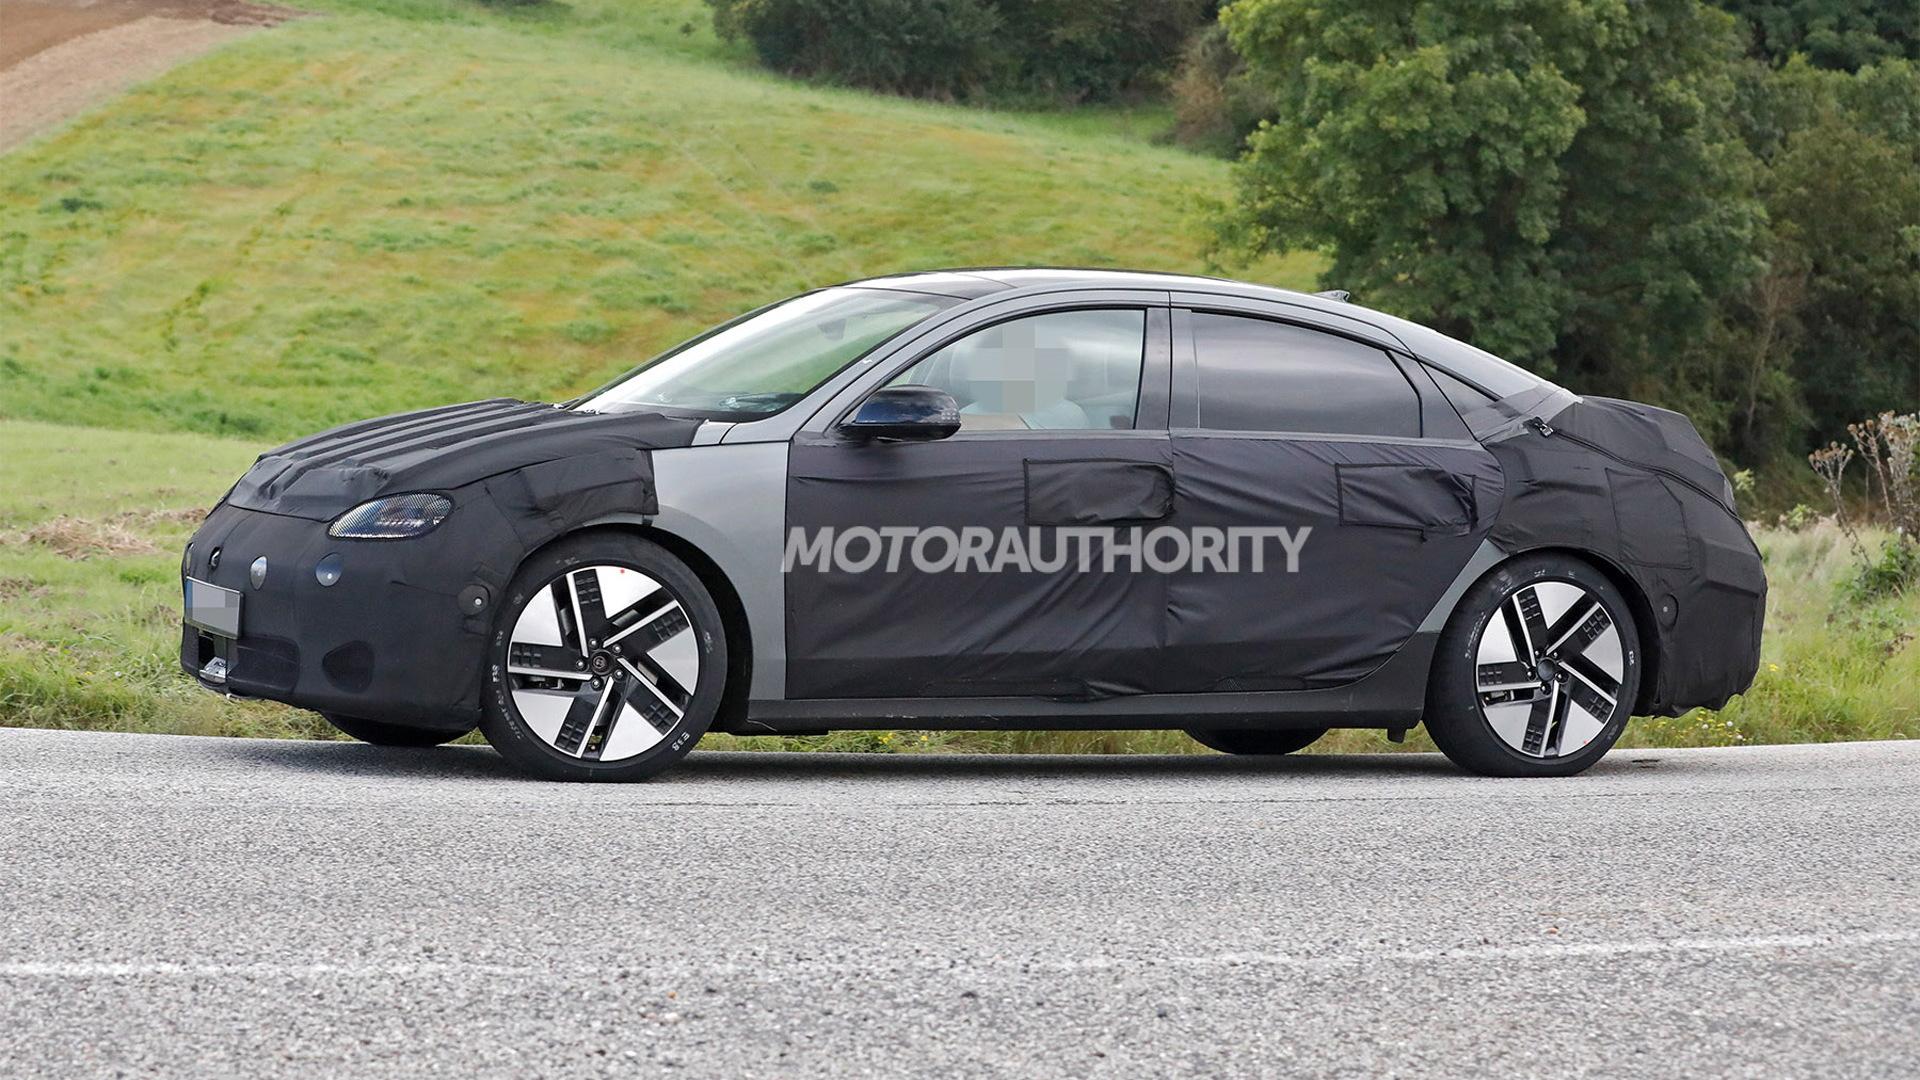 2023 Hyundai Ioniq 6 spy shots - Photo credit:S. Baldauf/SB-Medien